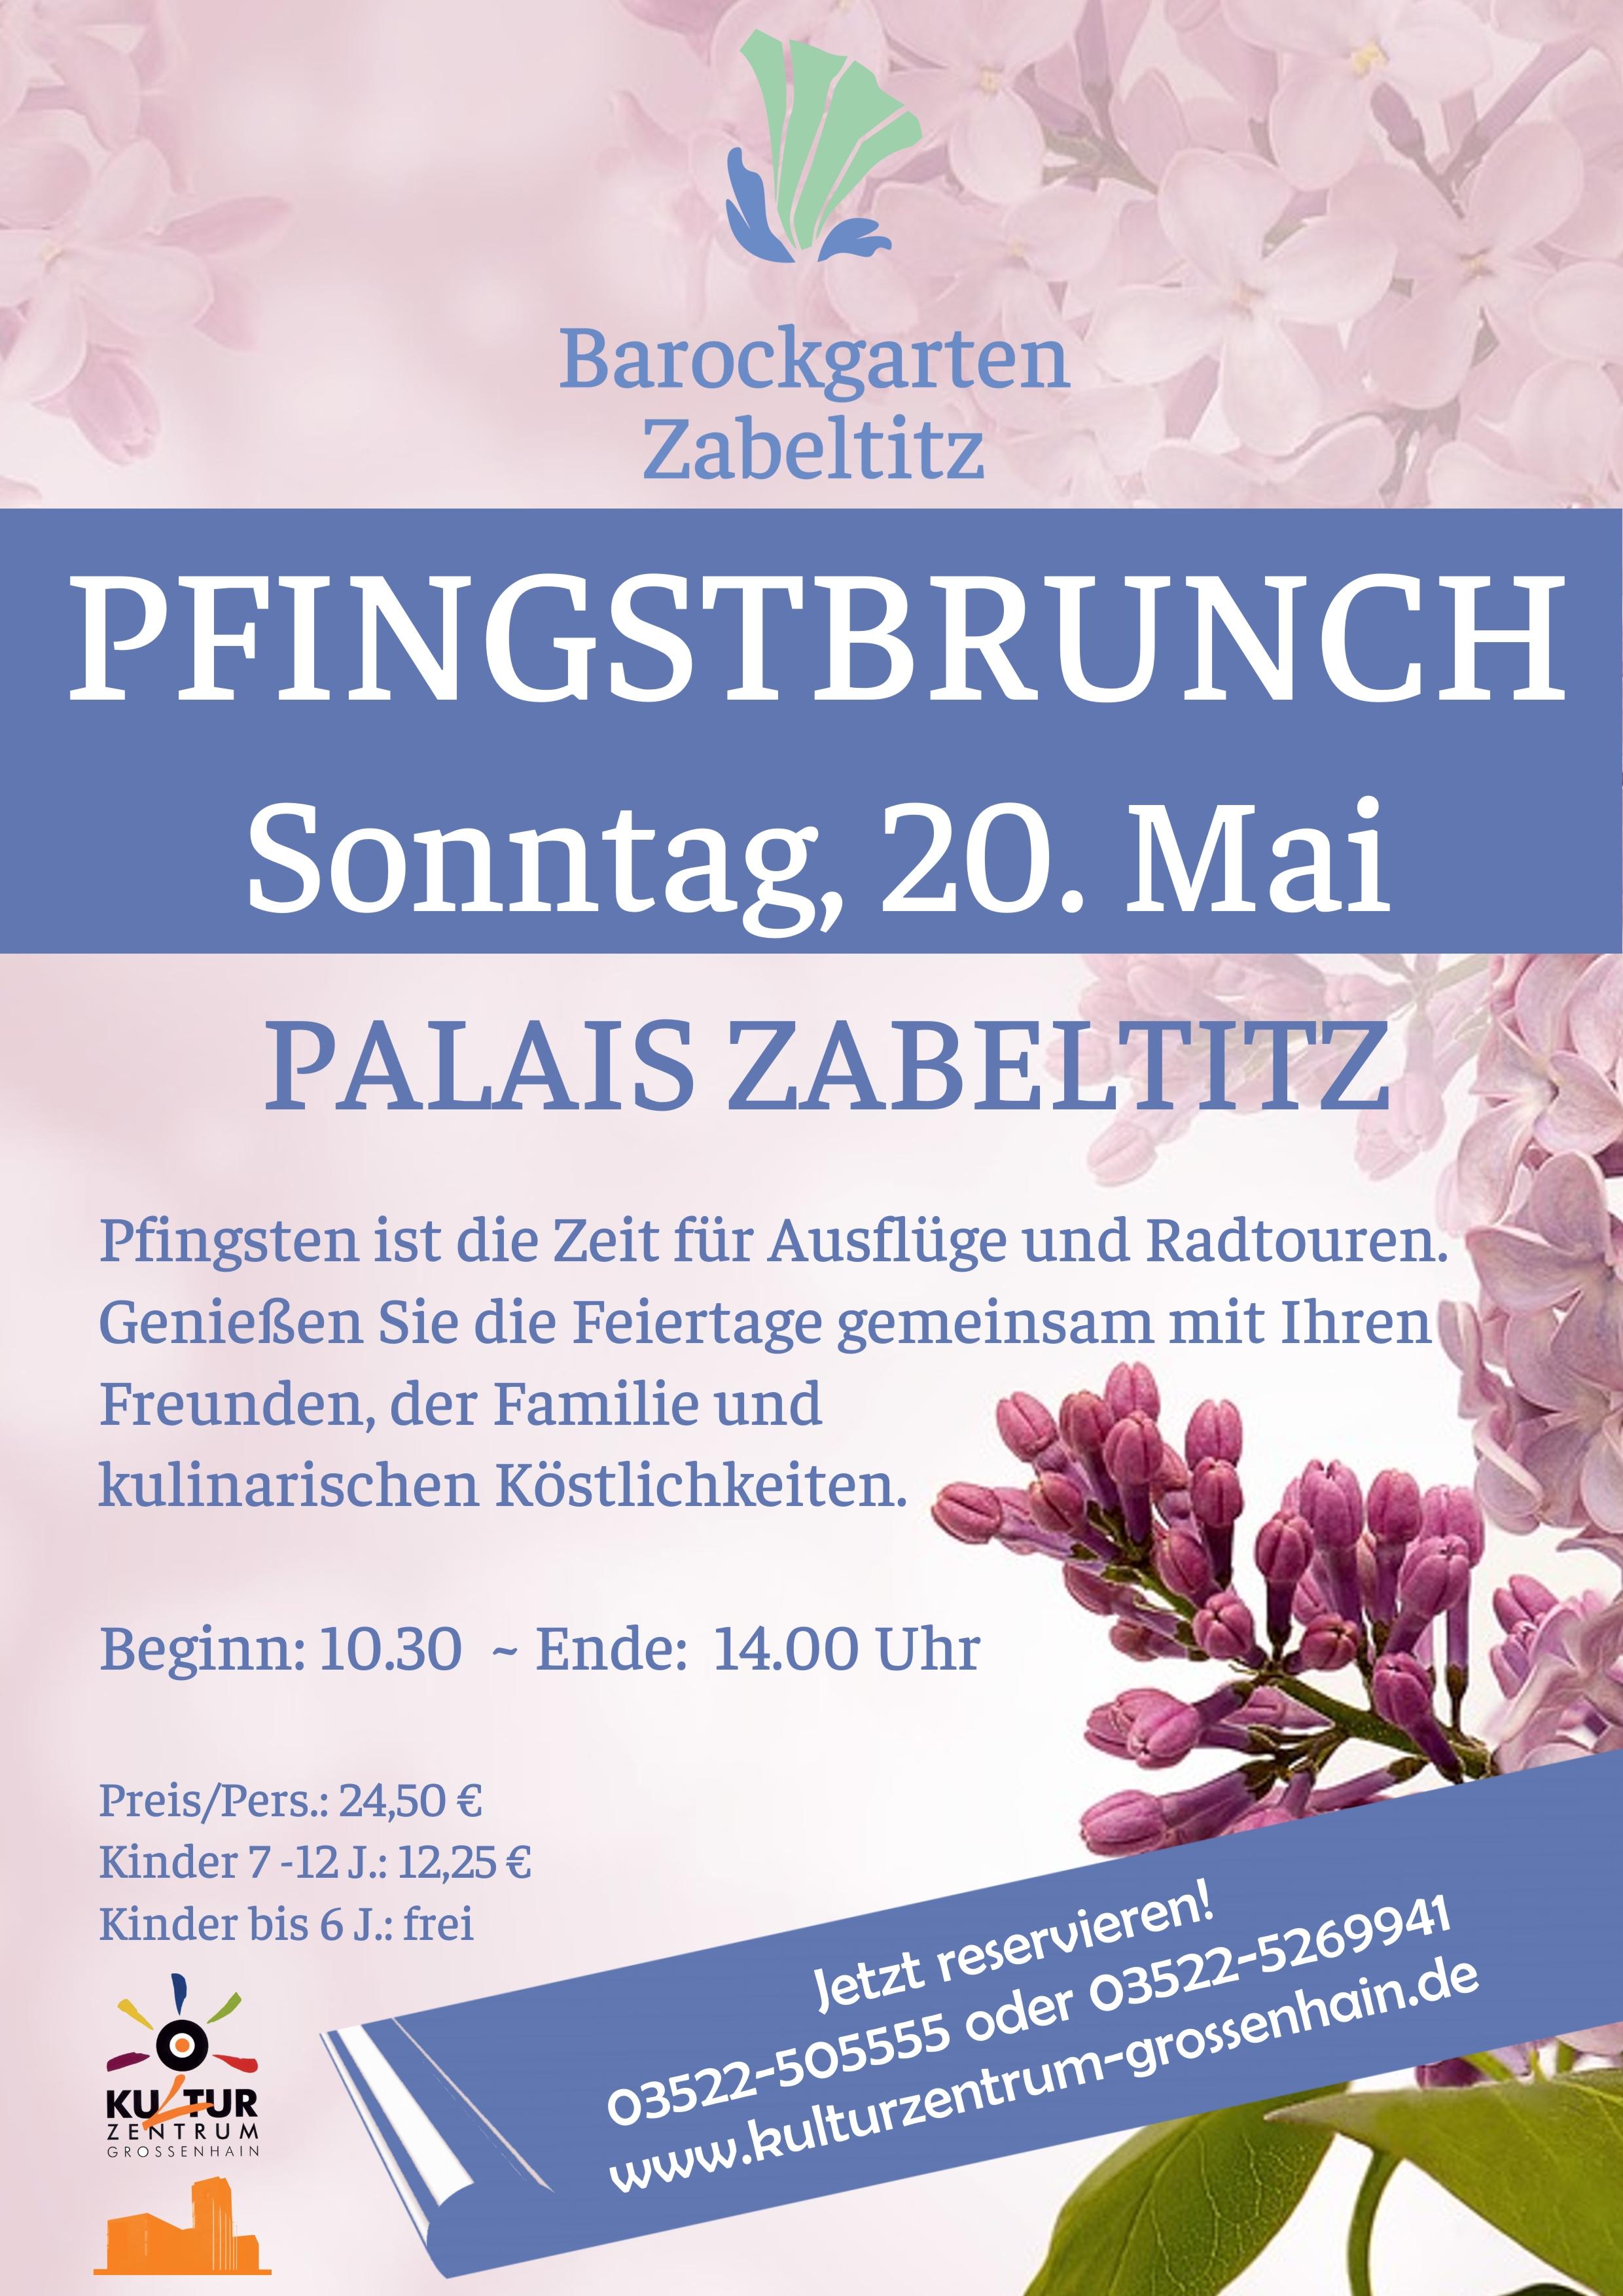 Pfingstbrunch im Palais Zabeltitz